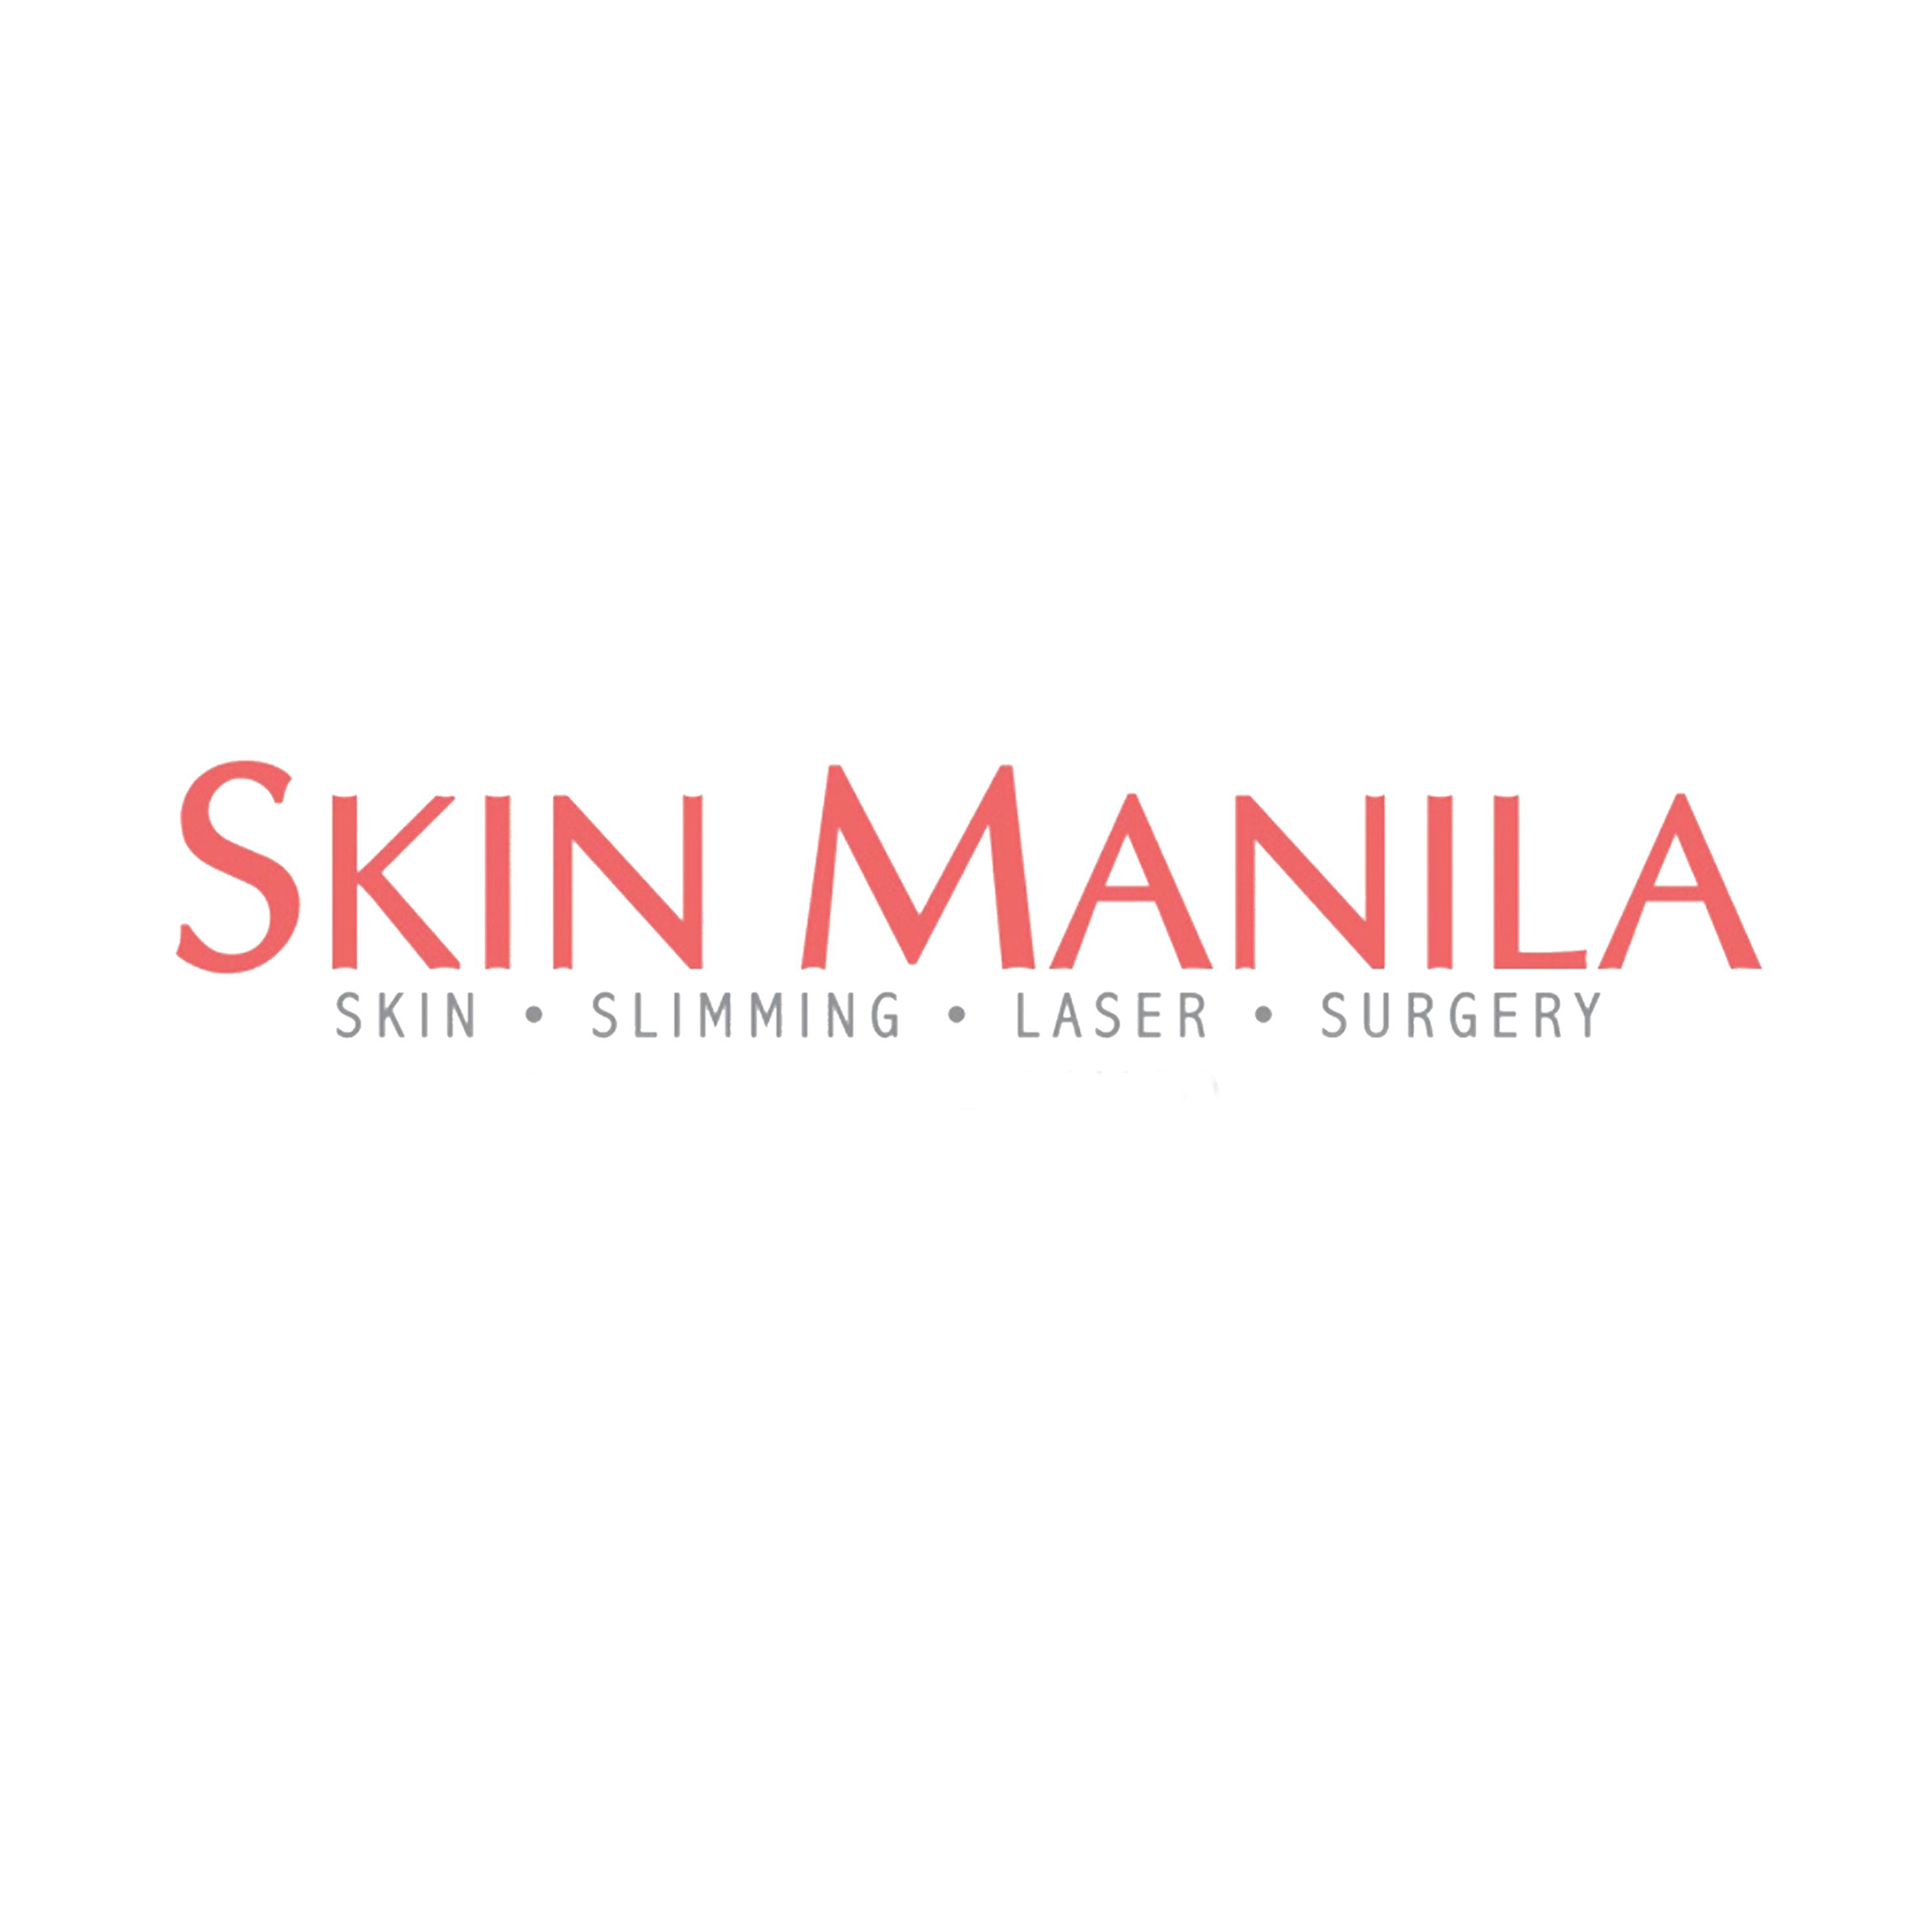 Skin Manila logo